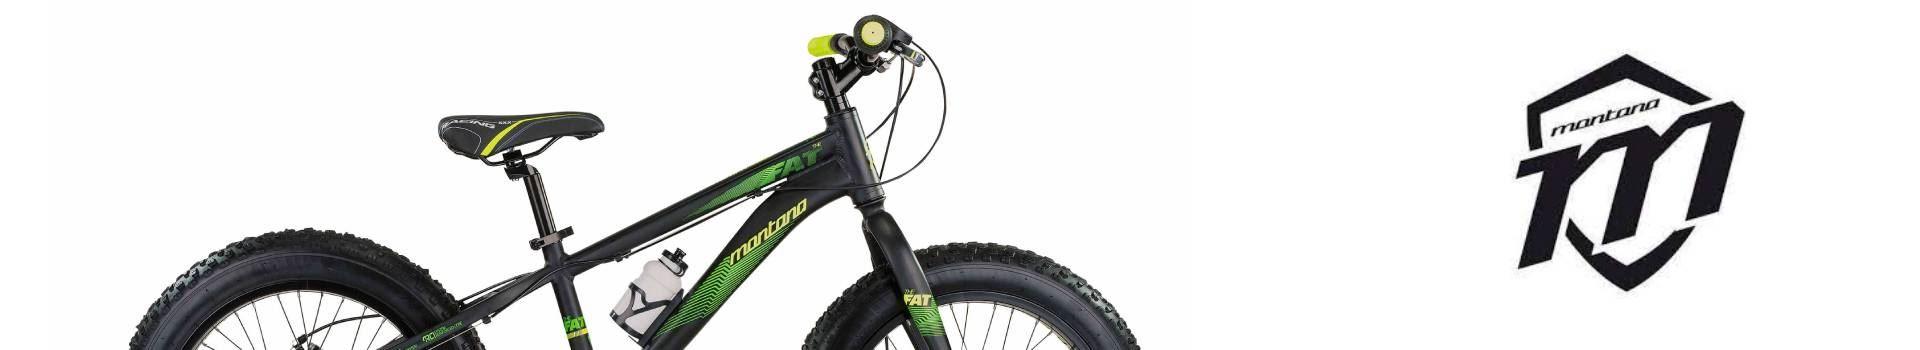 KIDS BICYCLES MONTANA MALTA